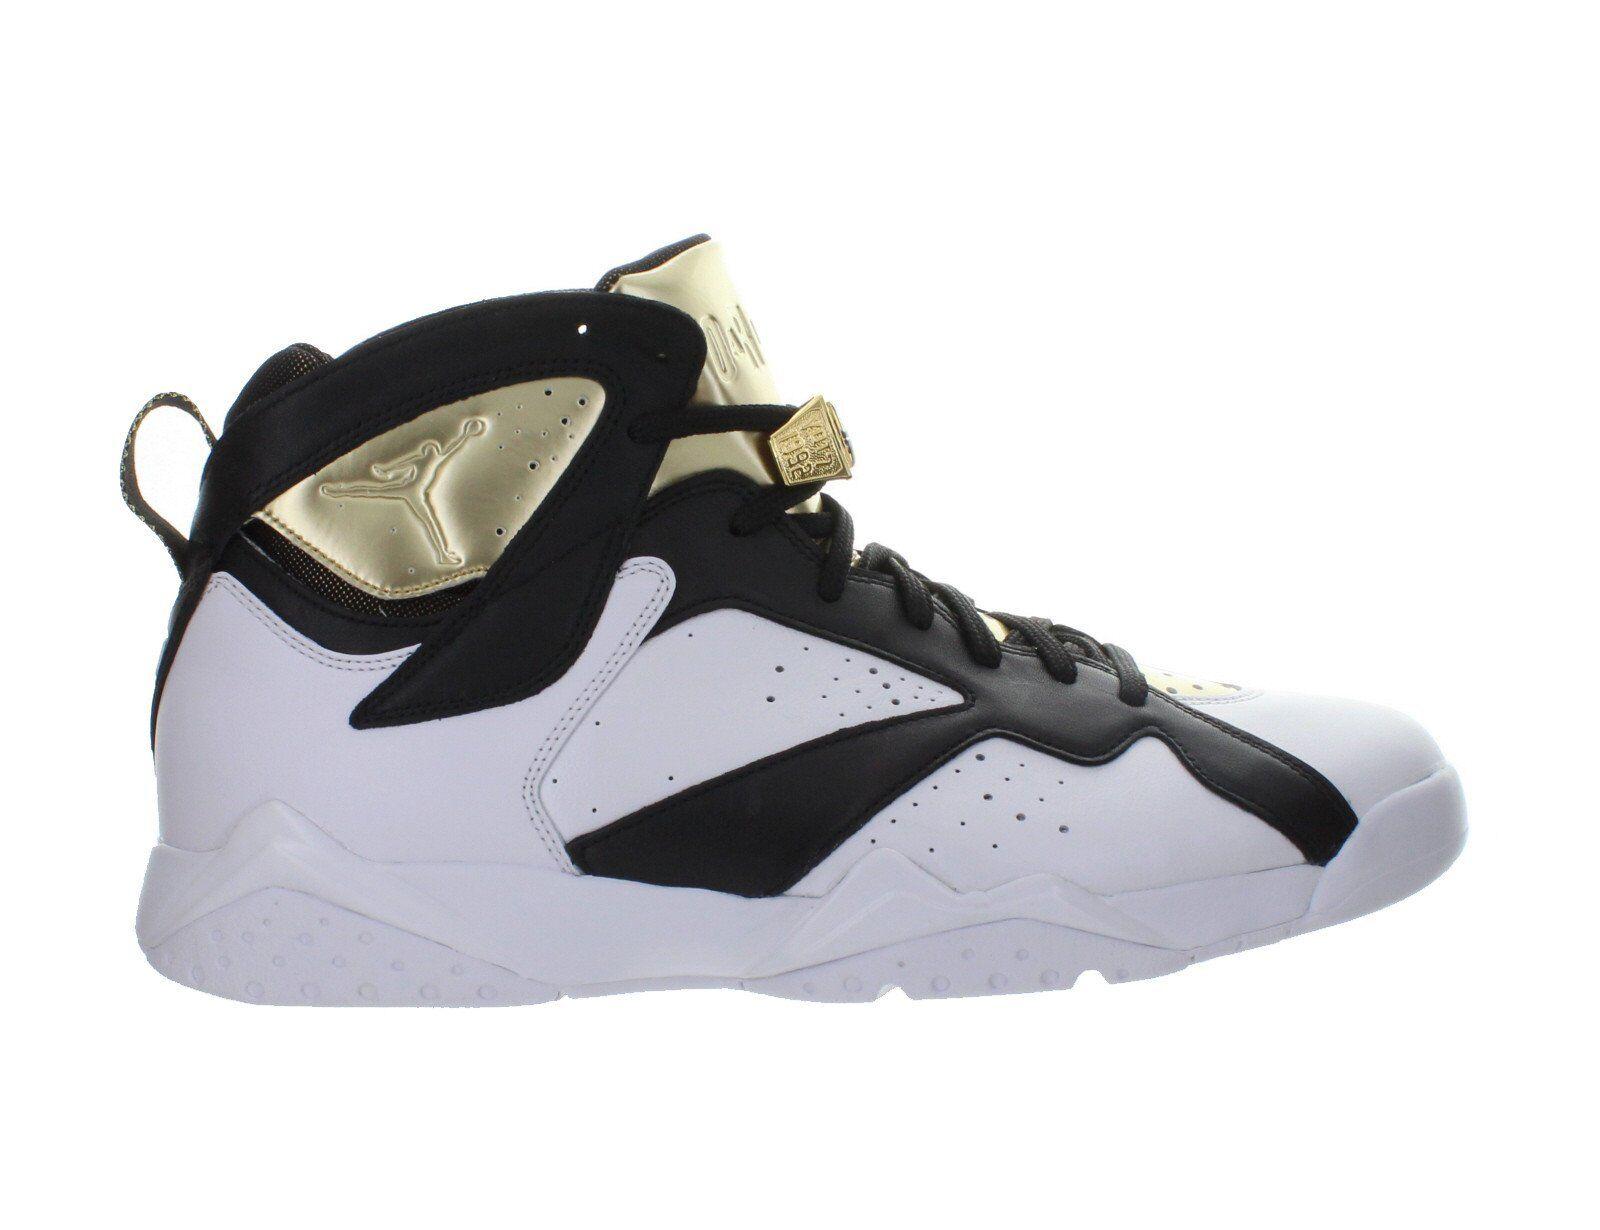 Mens Air Jordan 7 VII Retro C&C Championship Champagne White gold 725093-140